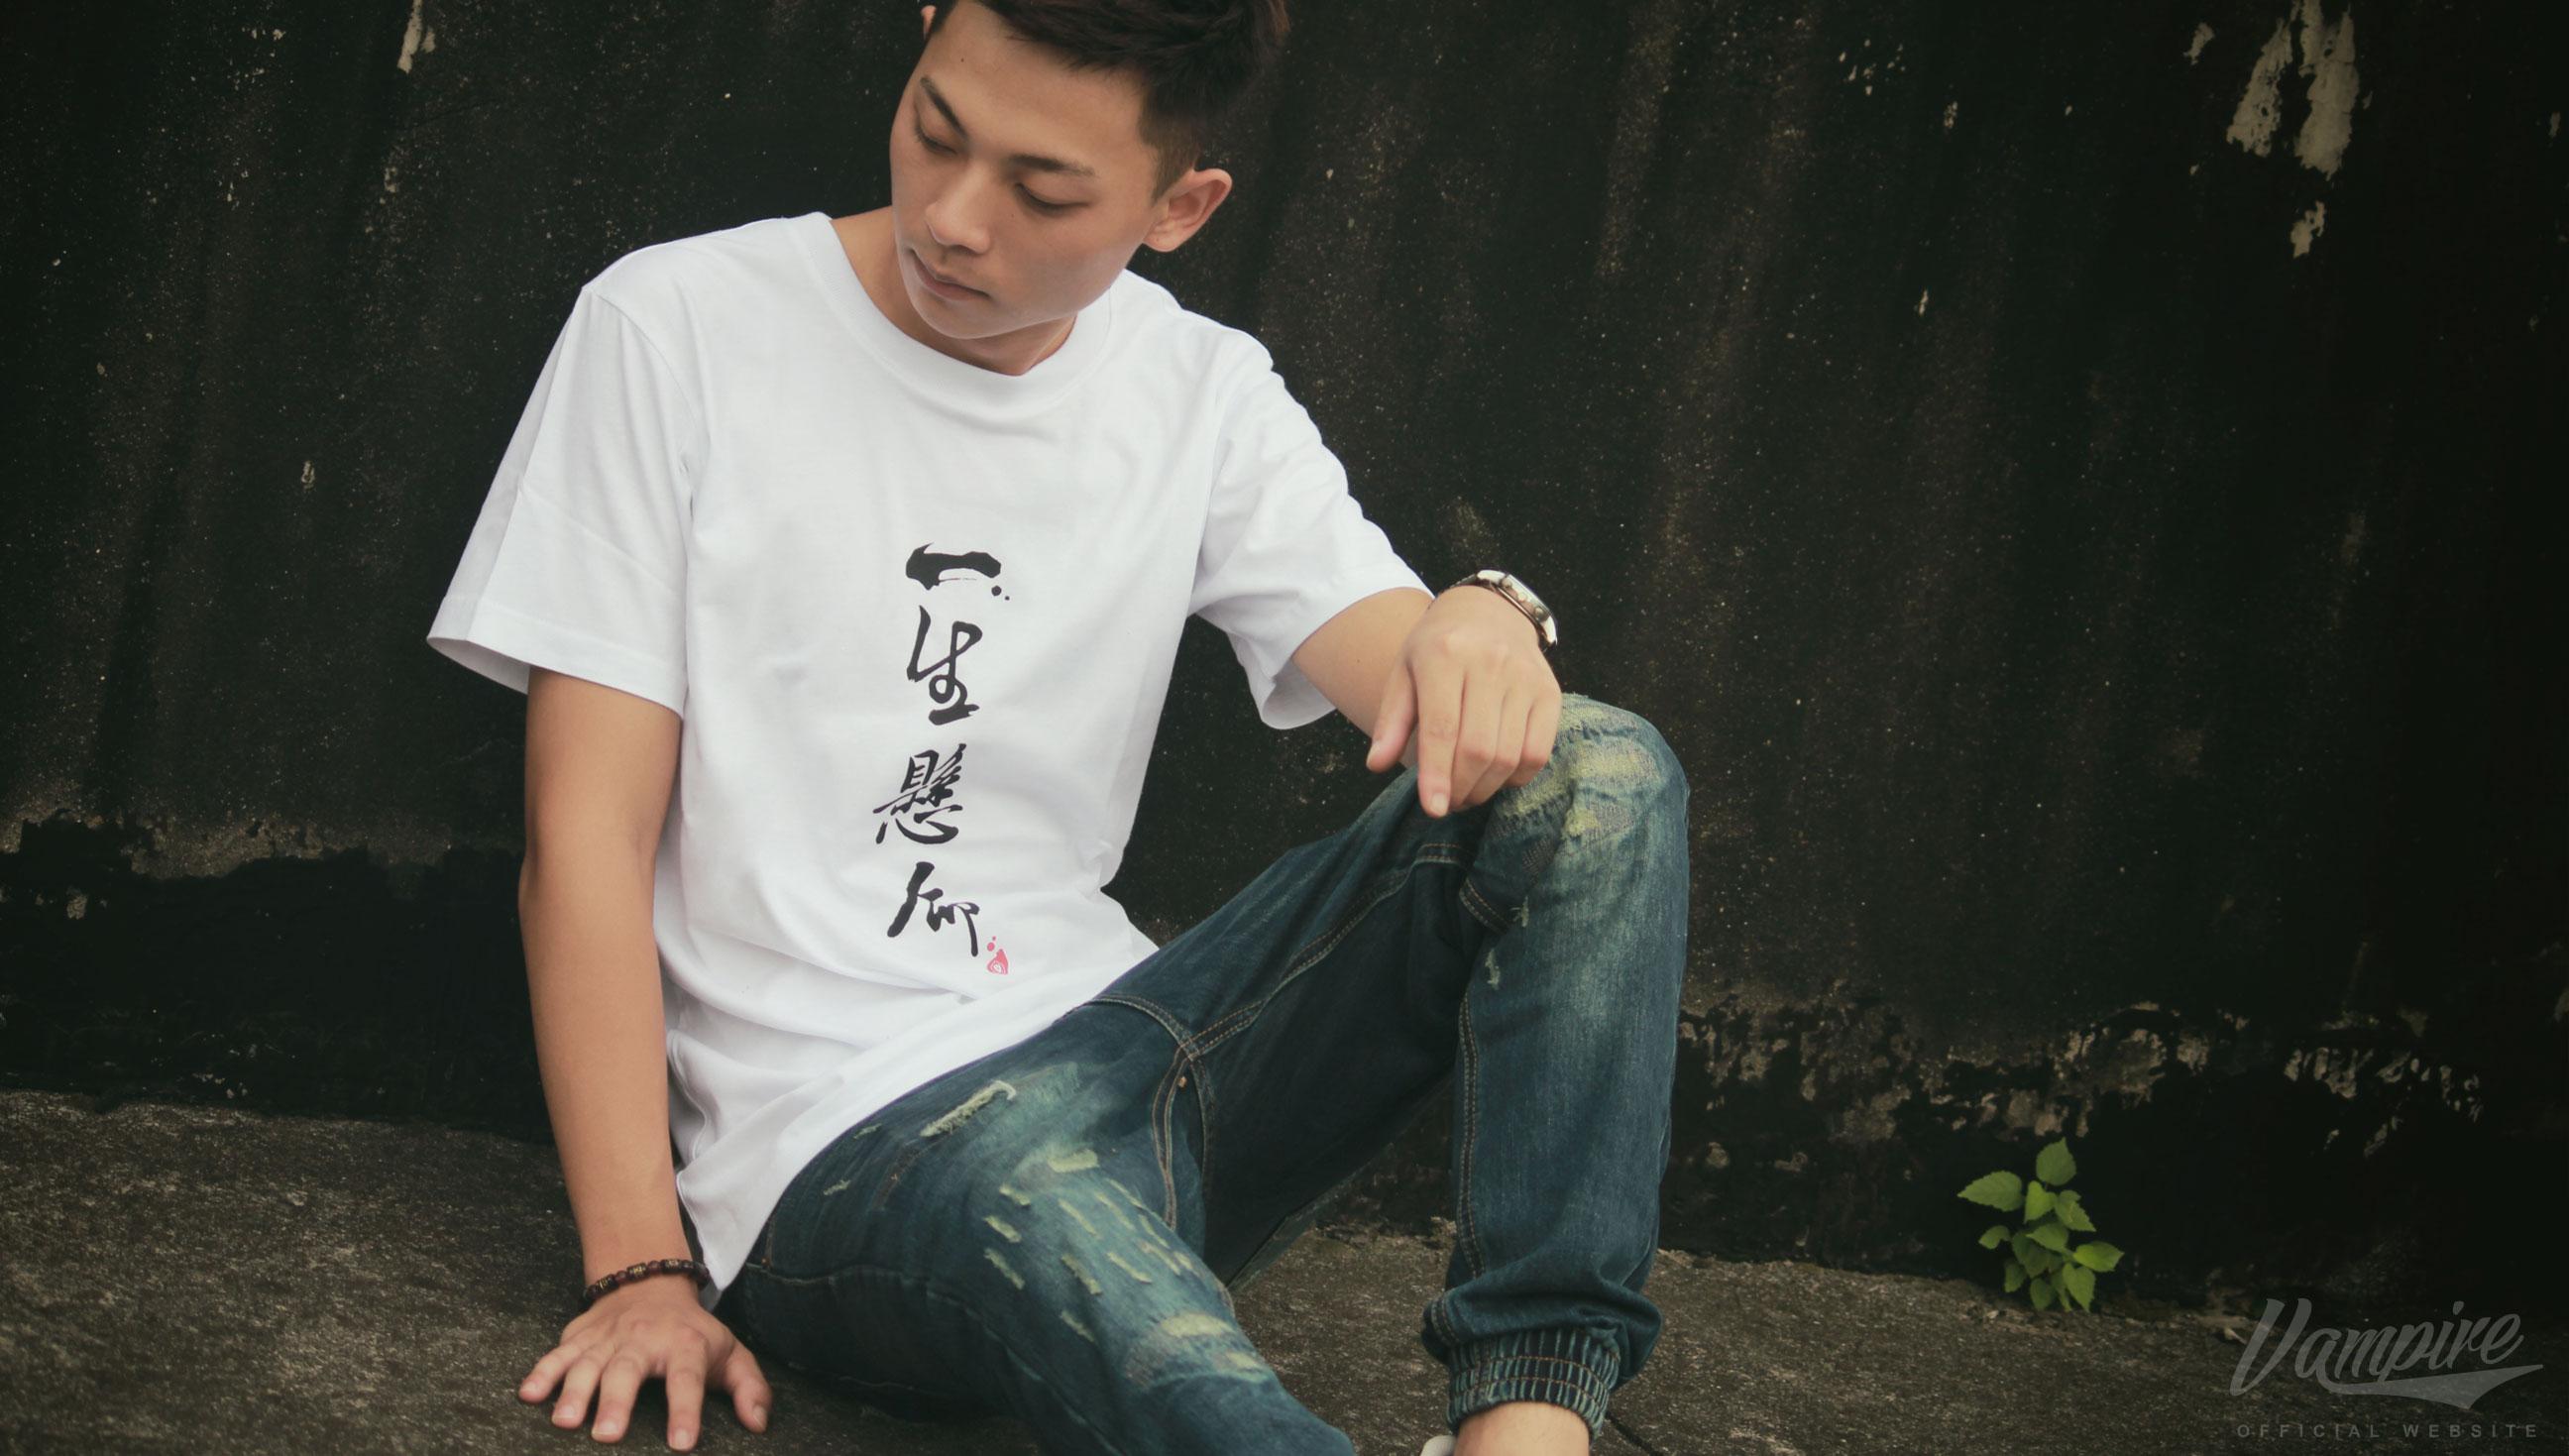 『 FREED ONLINE SHOP 』15 S S 「一生懸命」中文字復刻短TEE 白底黑字